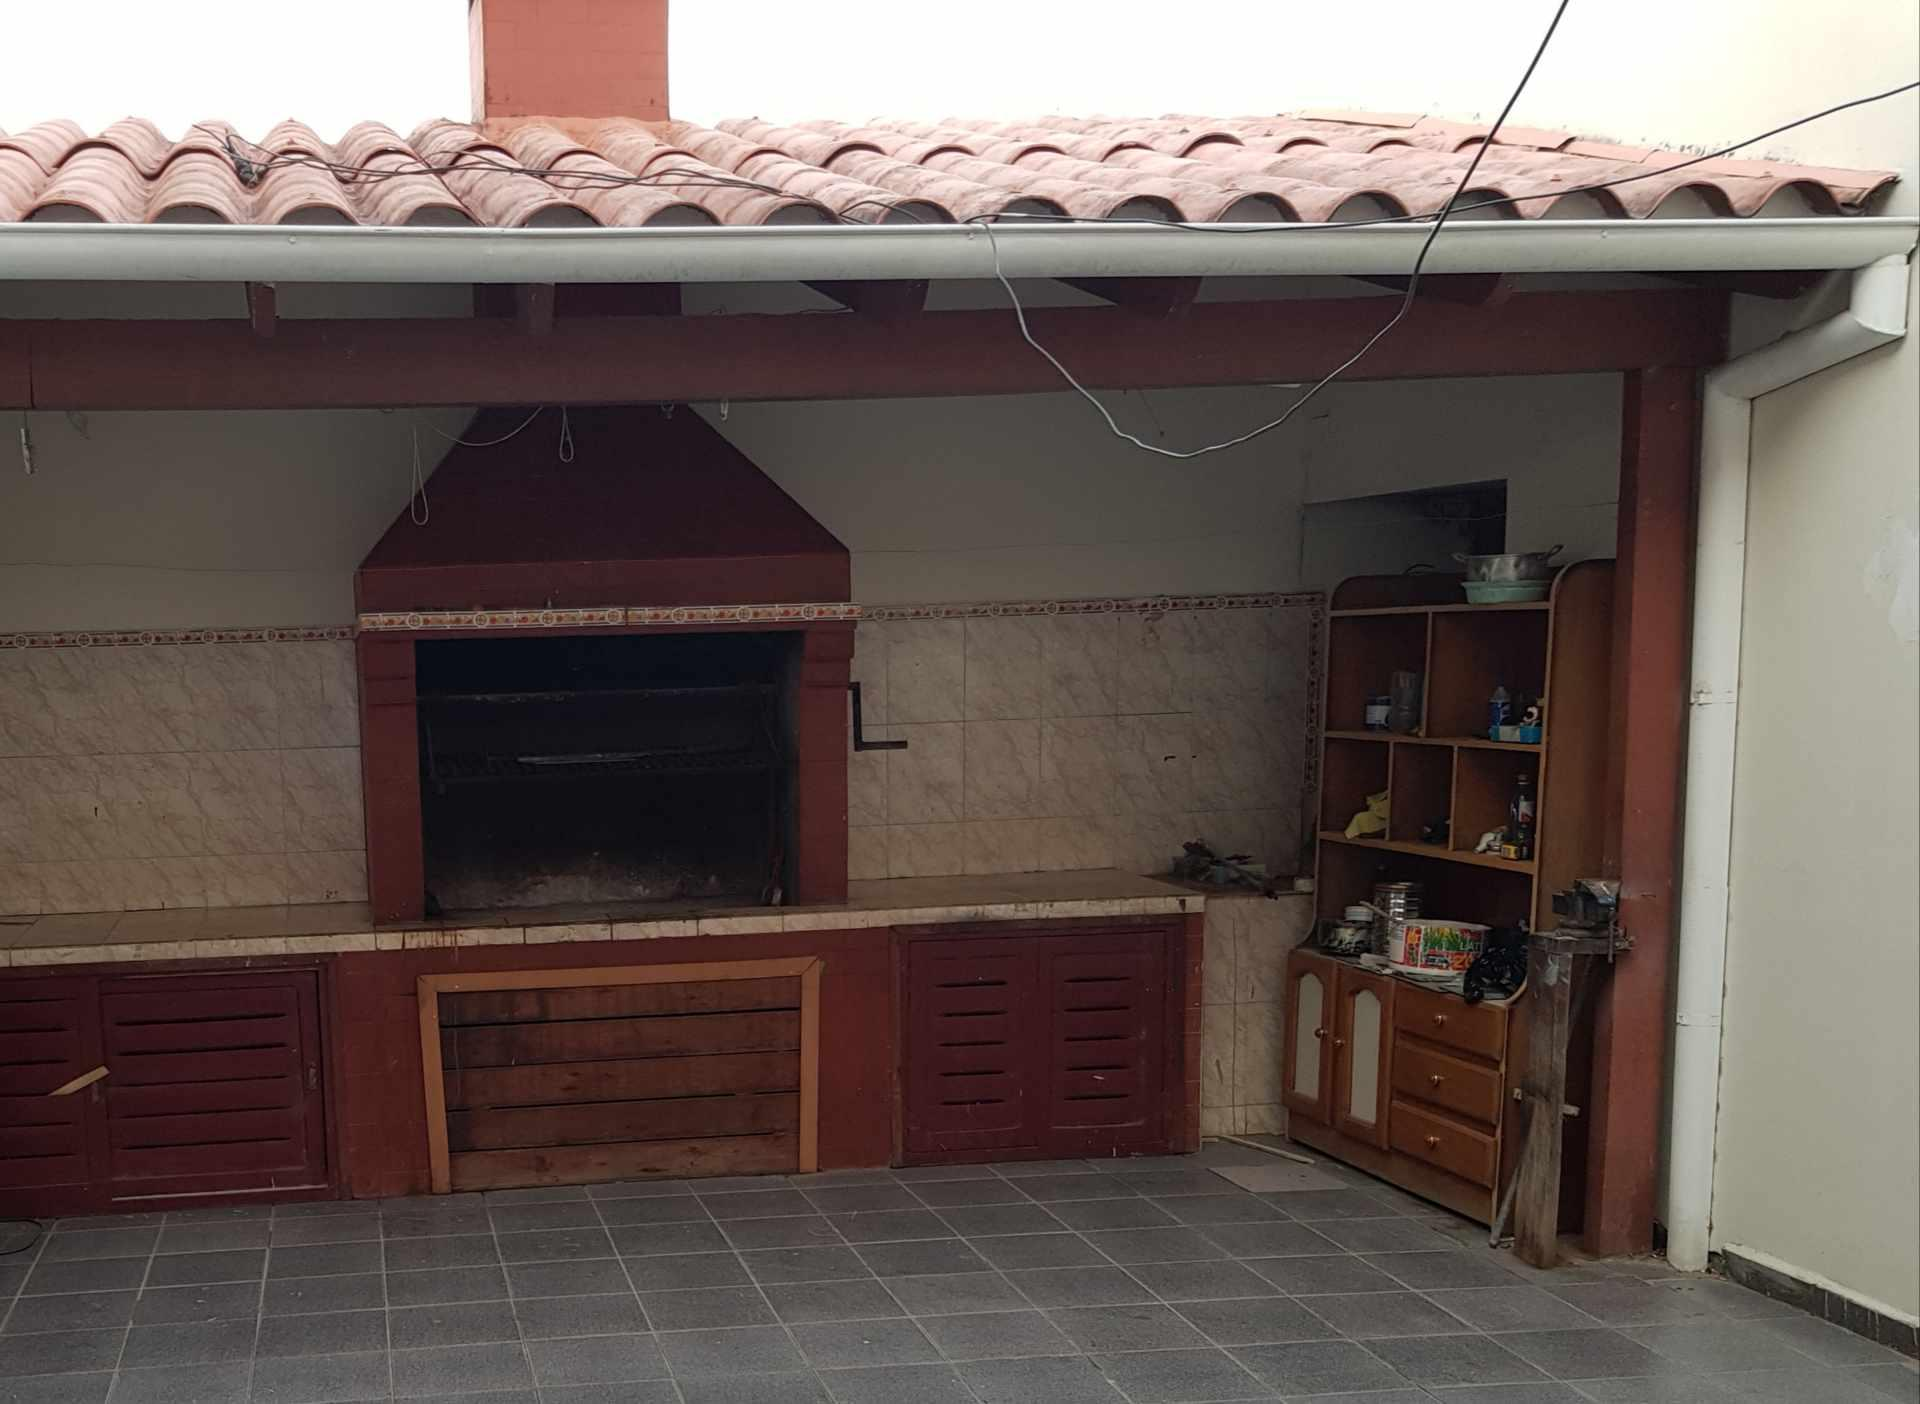 Casa en Venta AV. SUAREZ ARANA, 1 CUADRA ANTES DEL 2DO ANILLO Foto 3